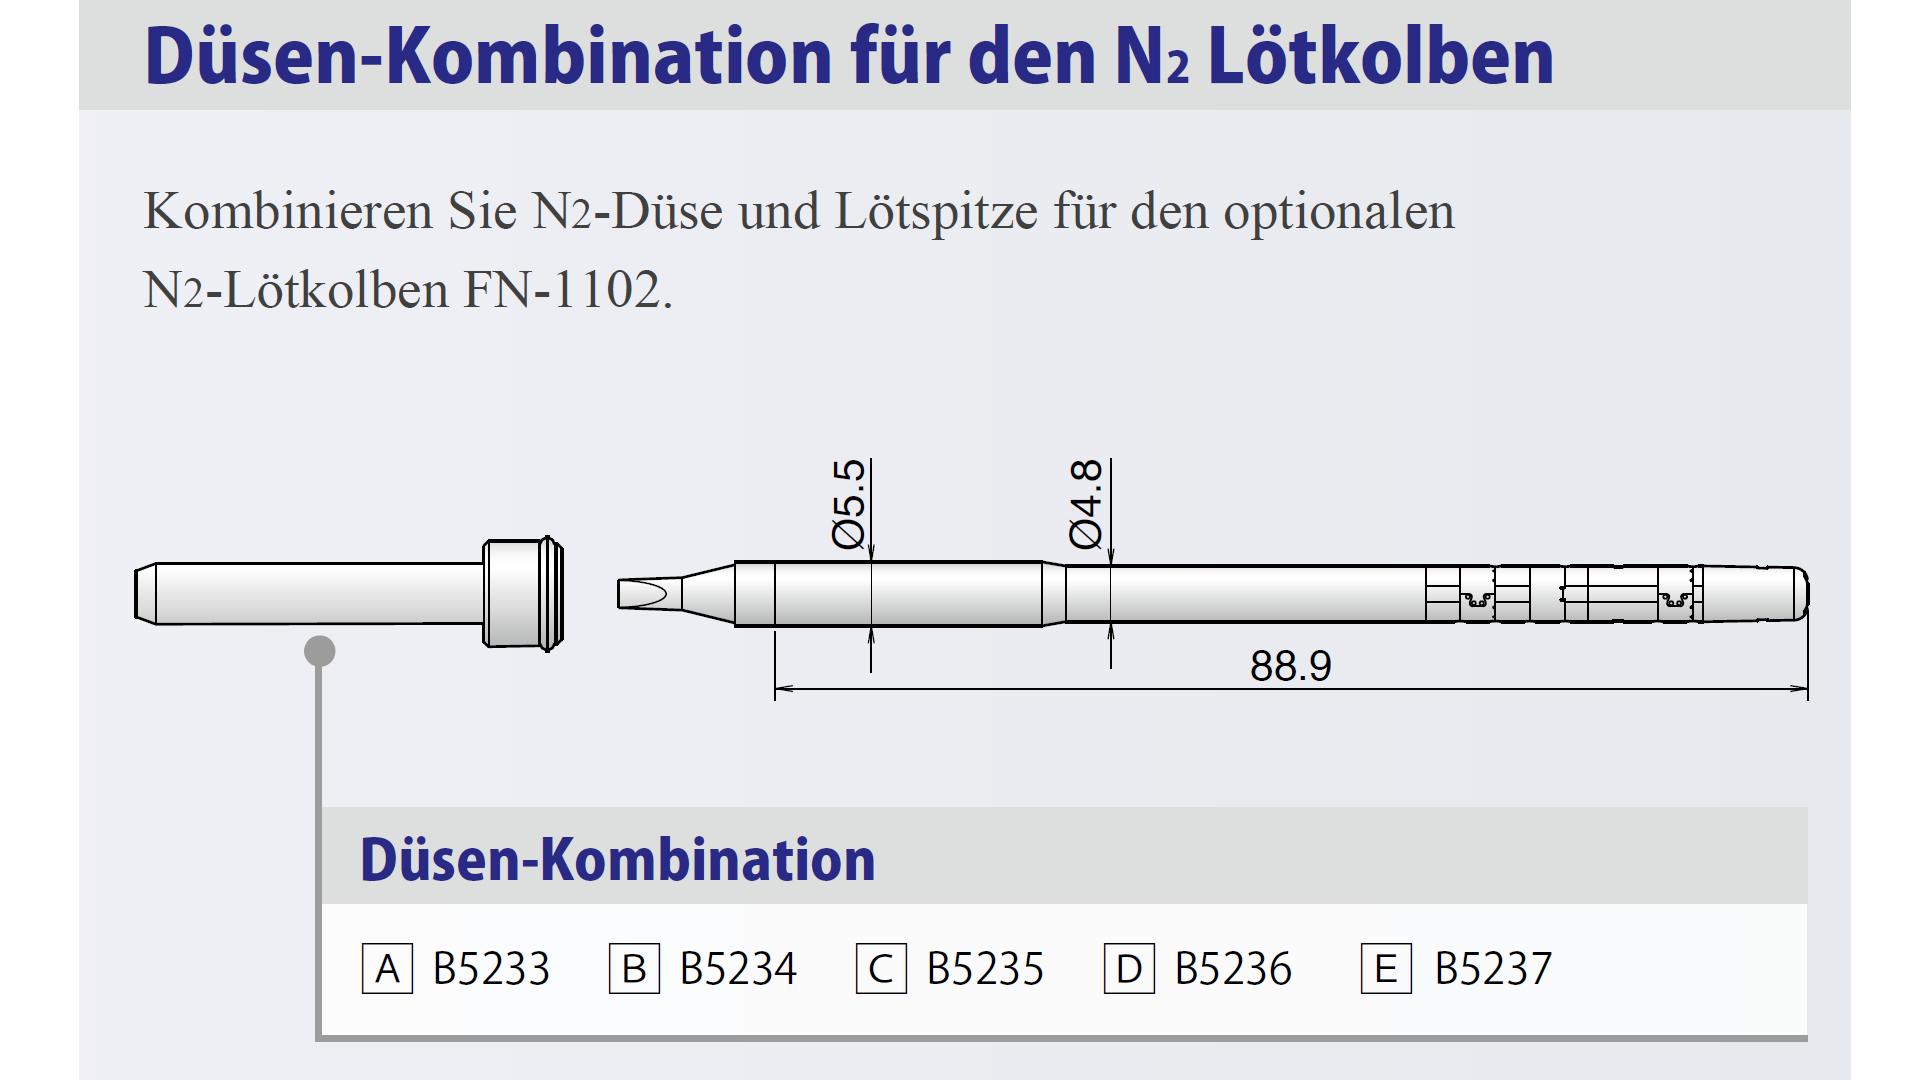 duesen-kombination-fuer-n2-loetkolben